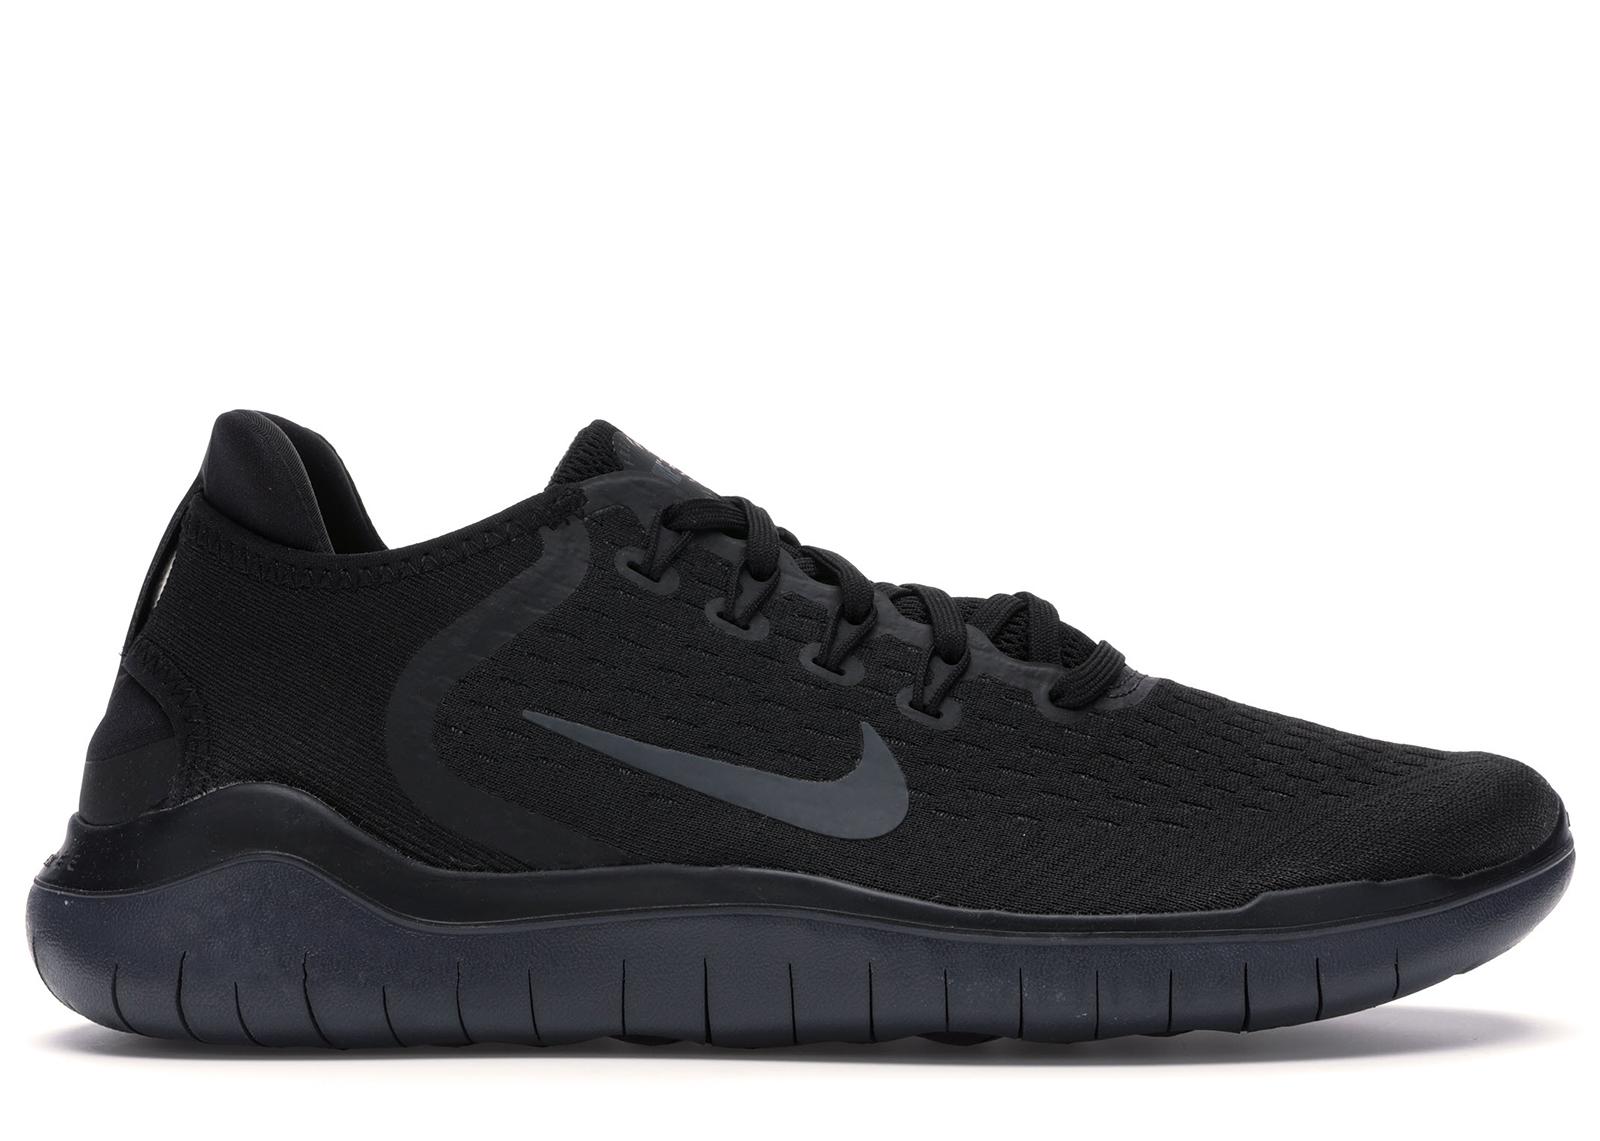 Nike Free Rn 2018 Black Anthracite